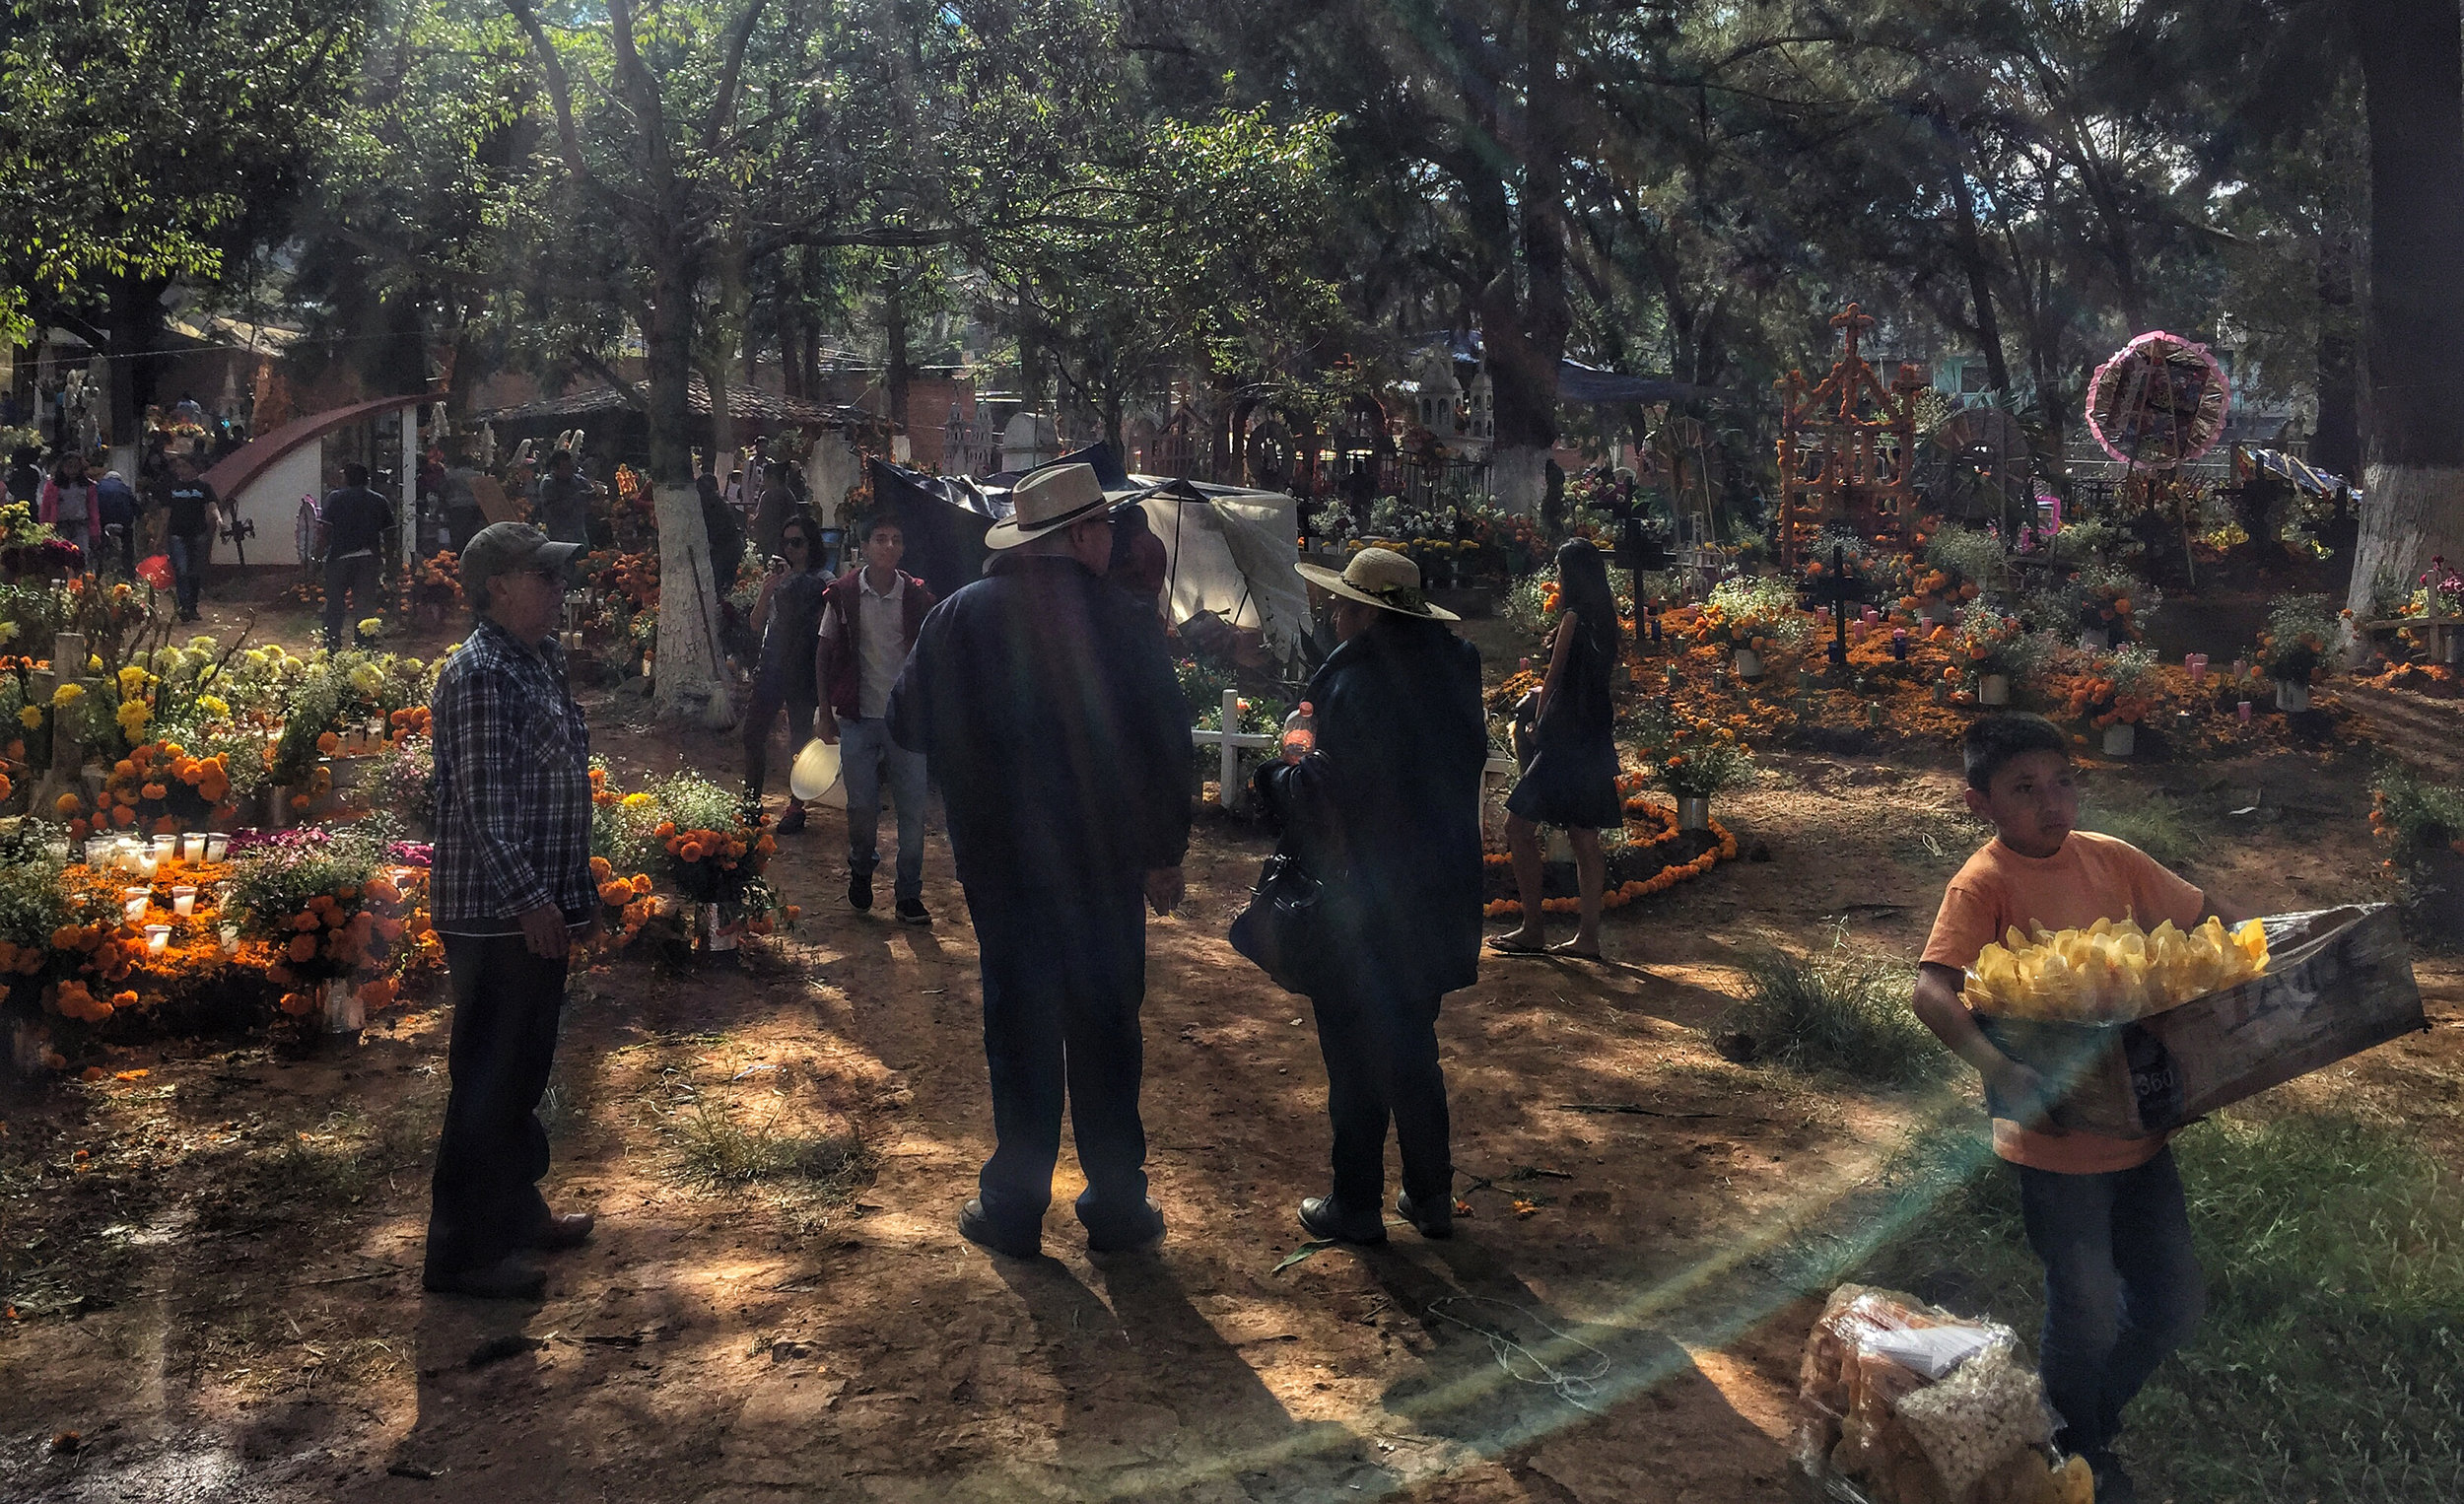 The busy Tsin Tsun Tsan cemetery the day before.